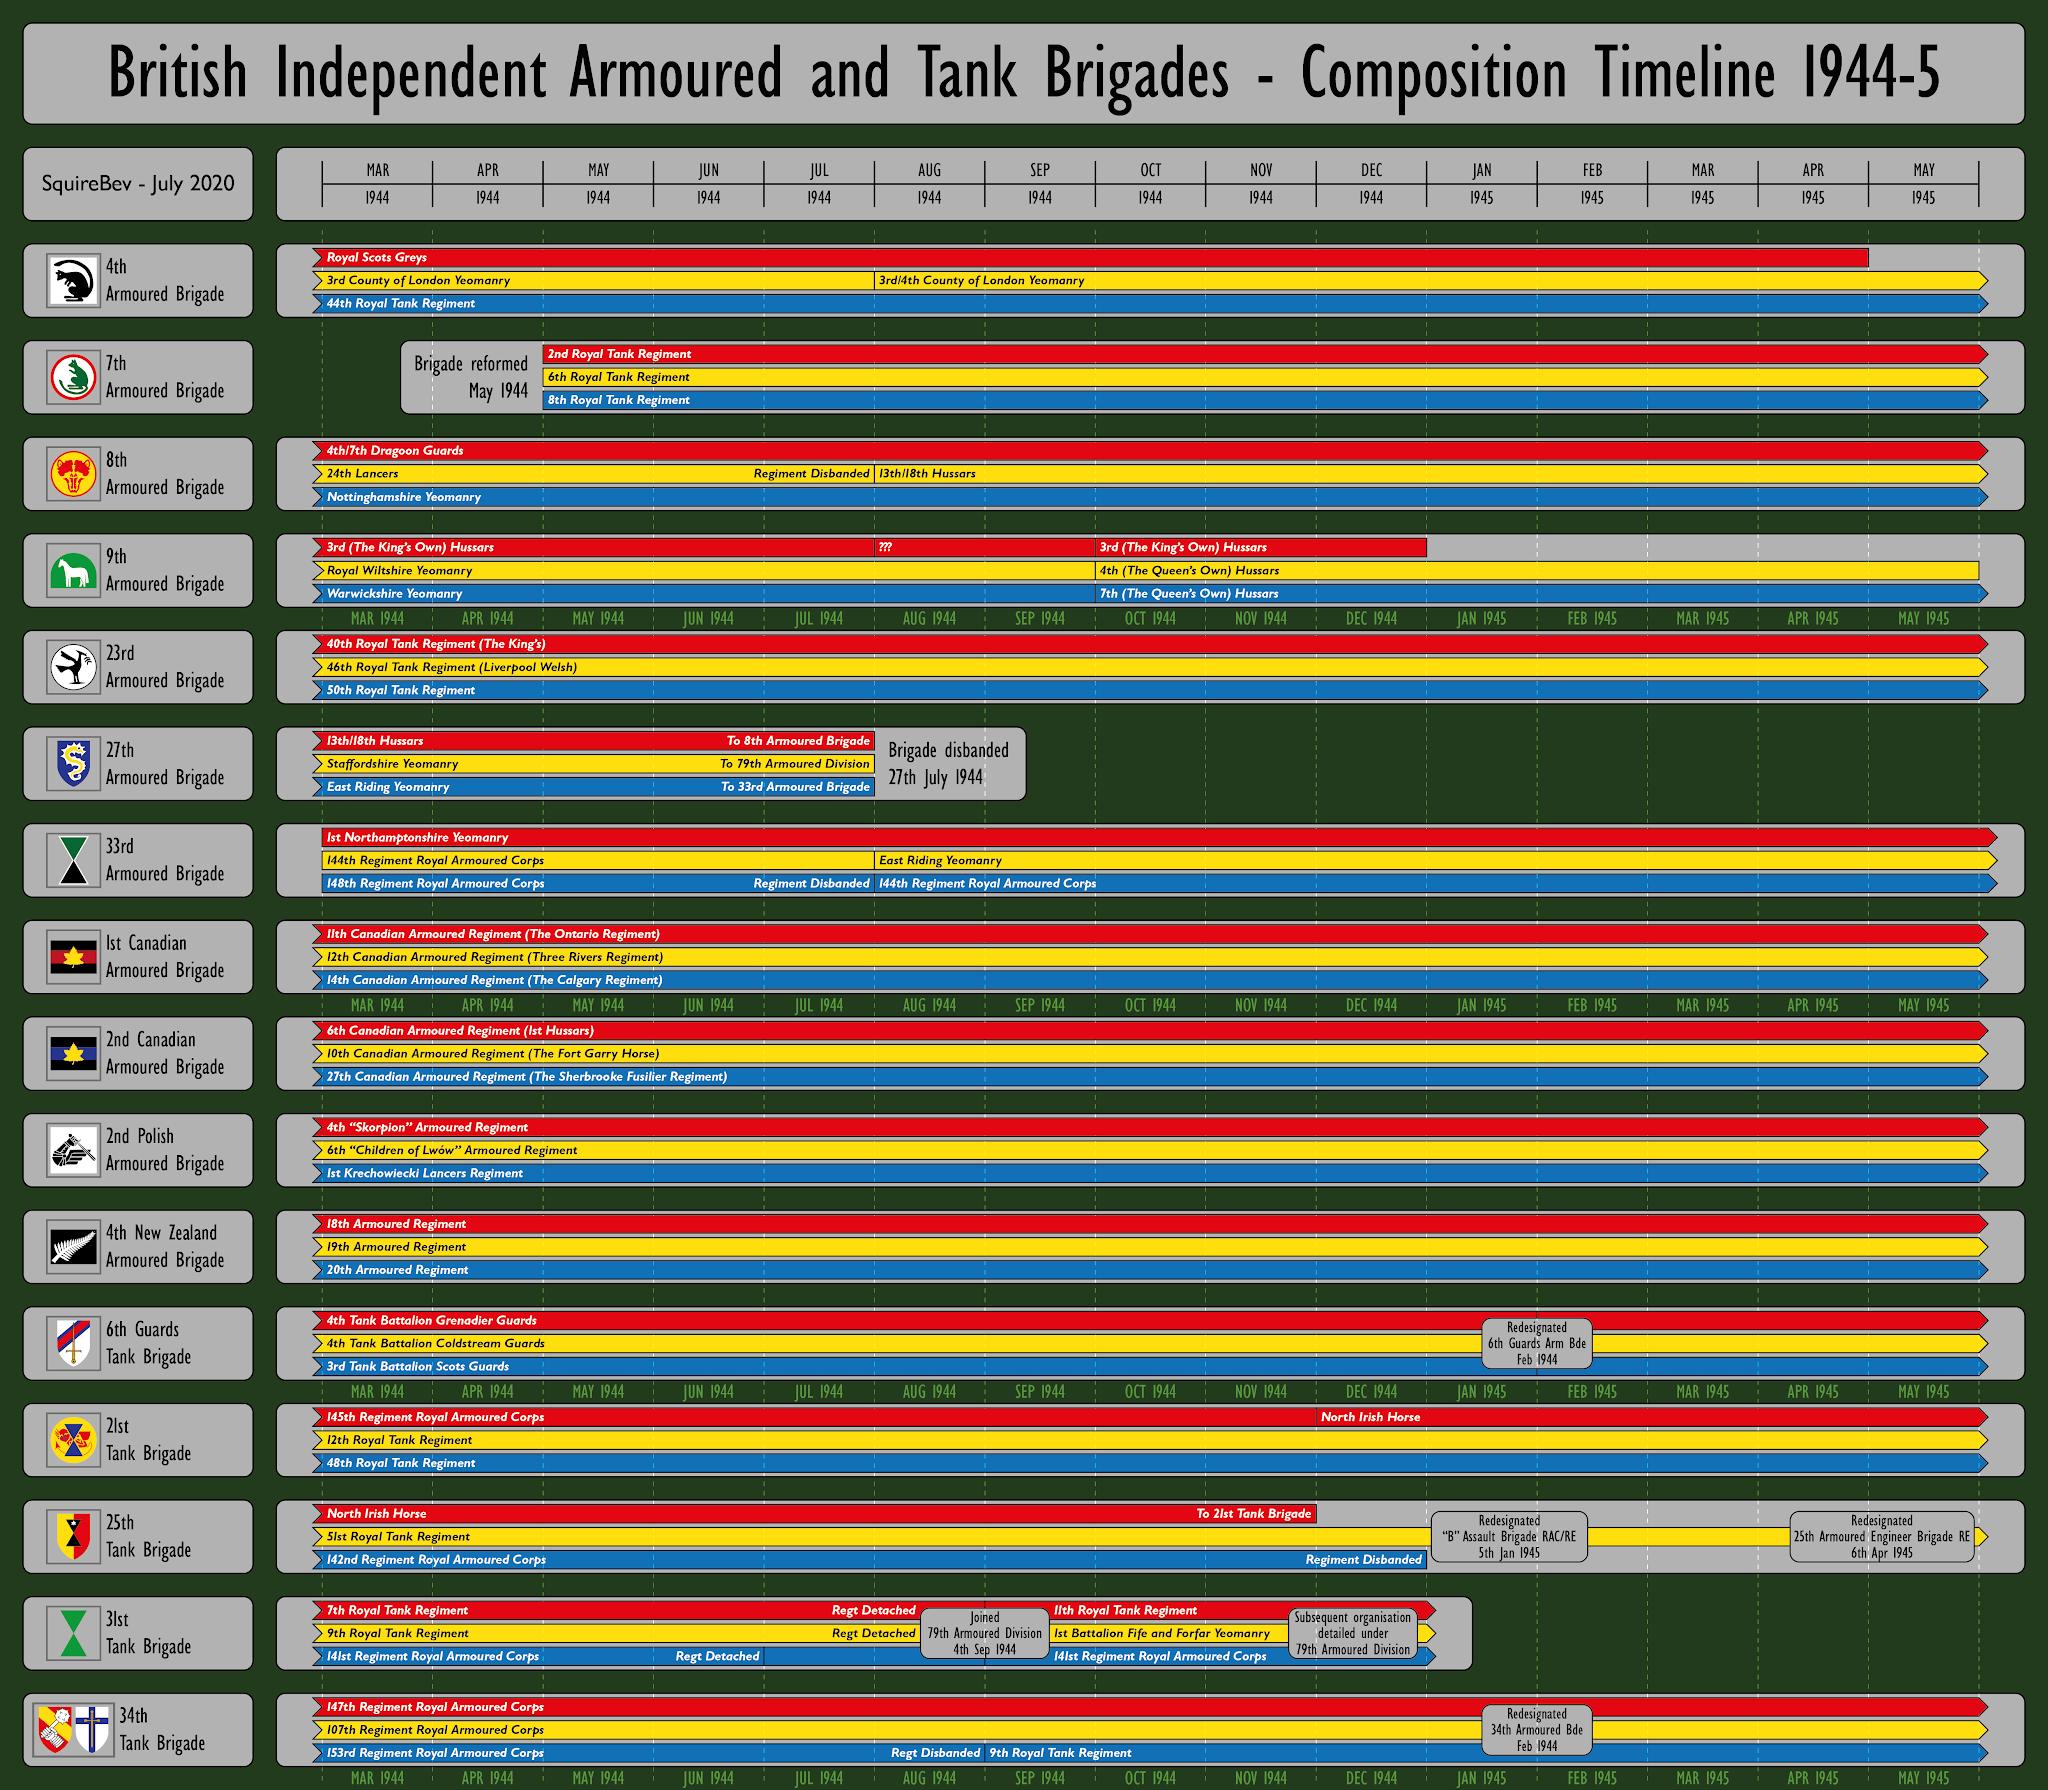 UK+-+Independent+Armoured+Brigades+Timel